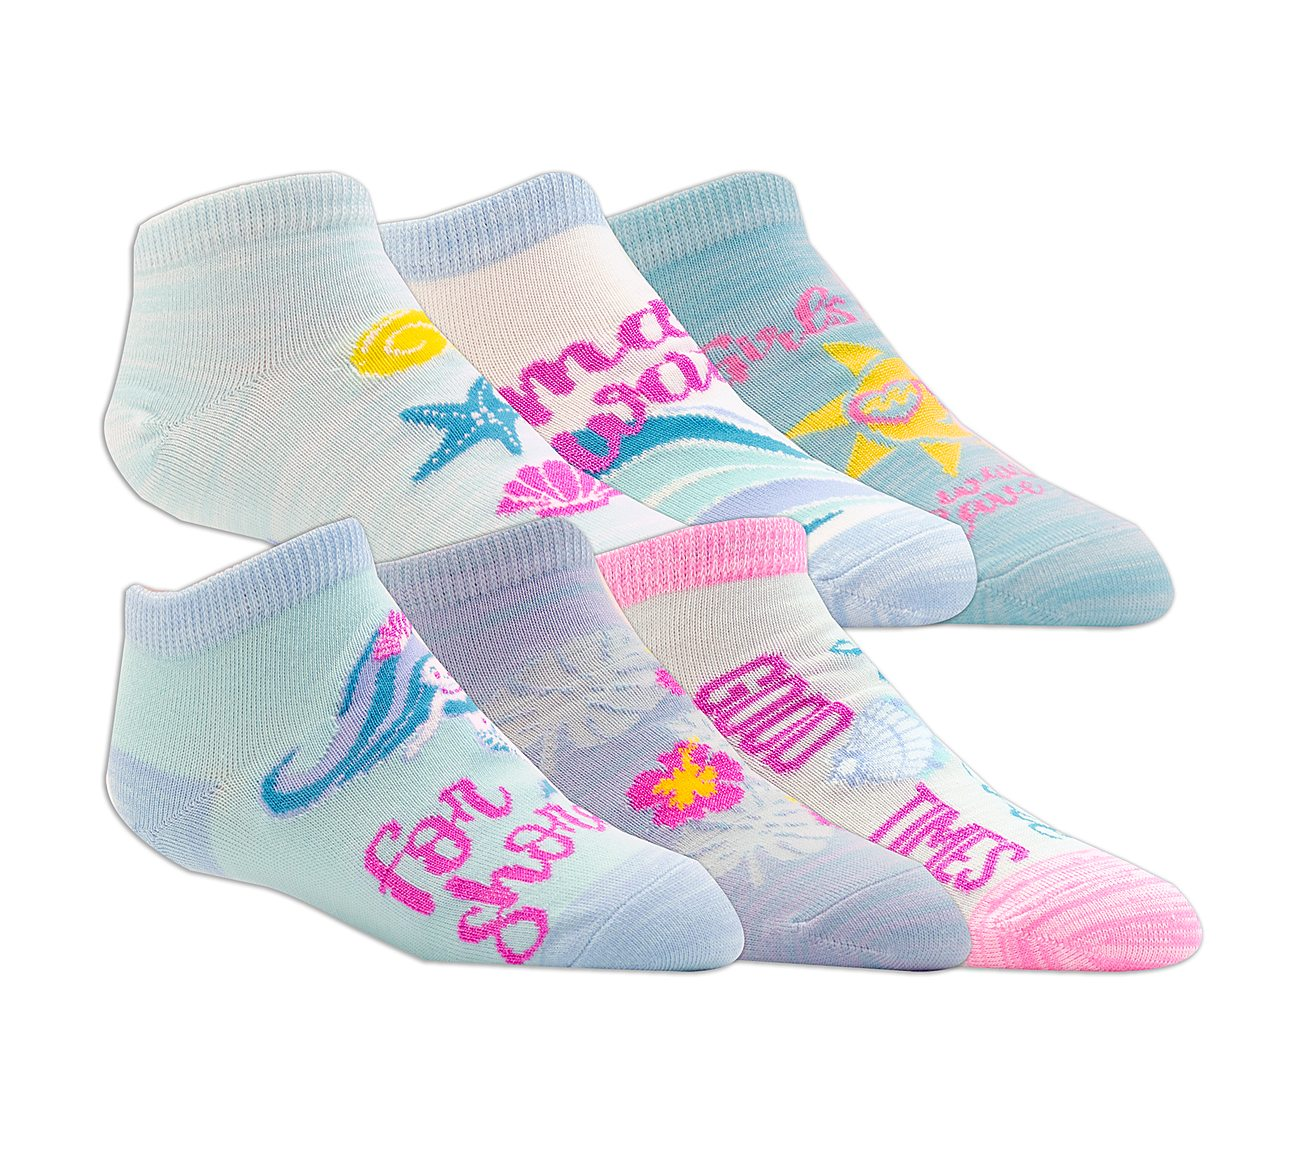 6 Pack Low Cut Beach Socks